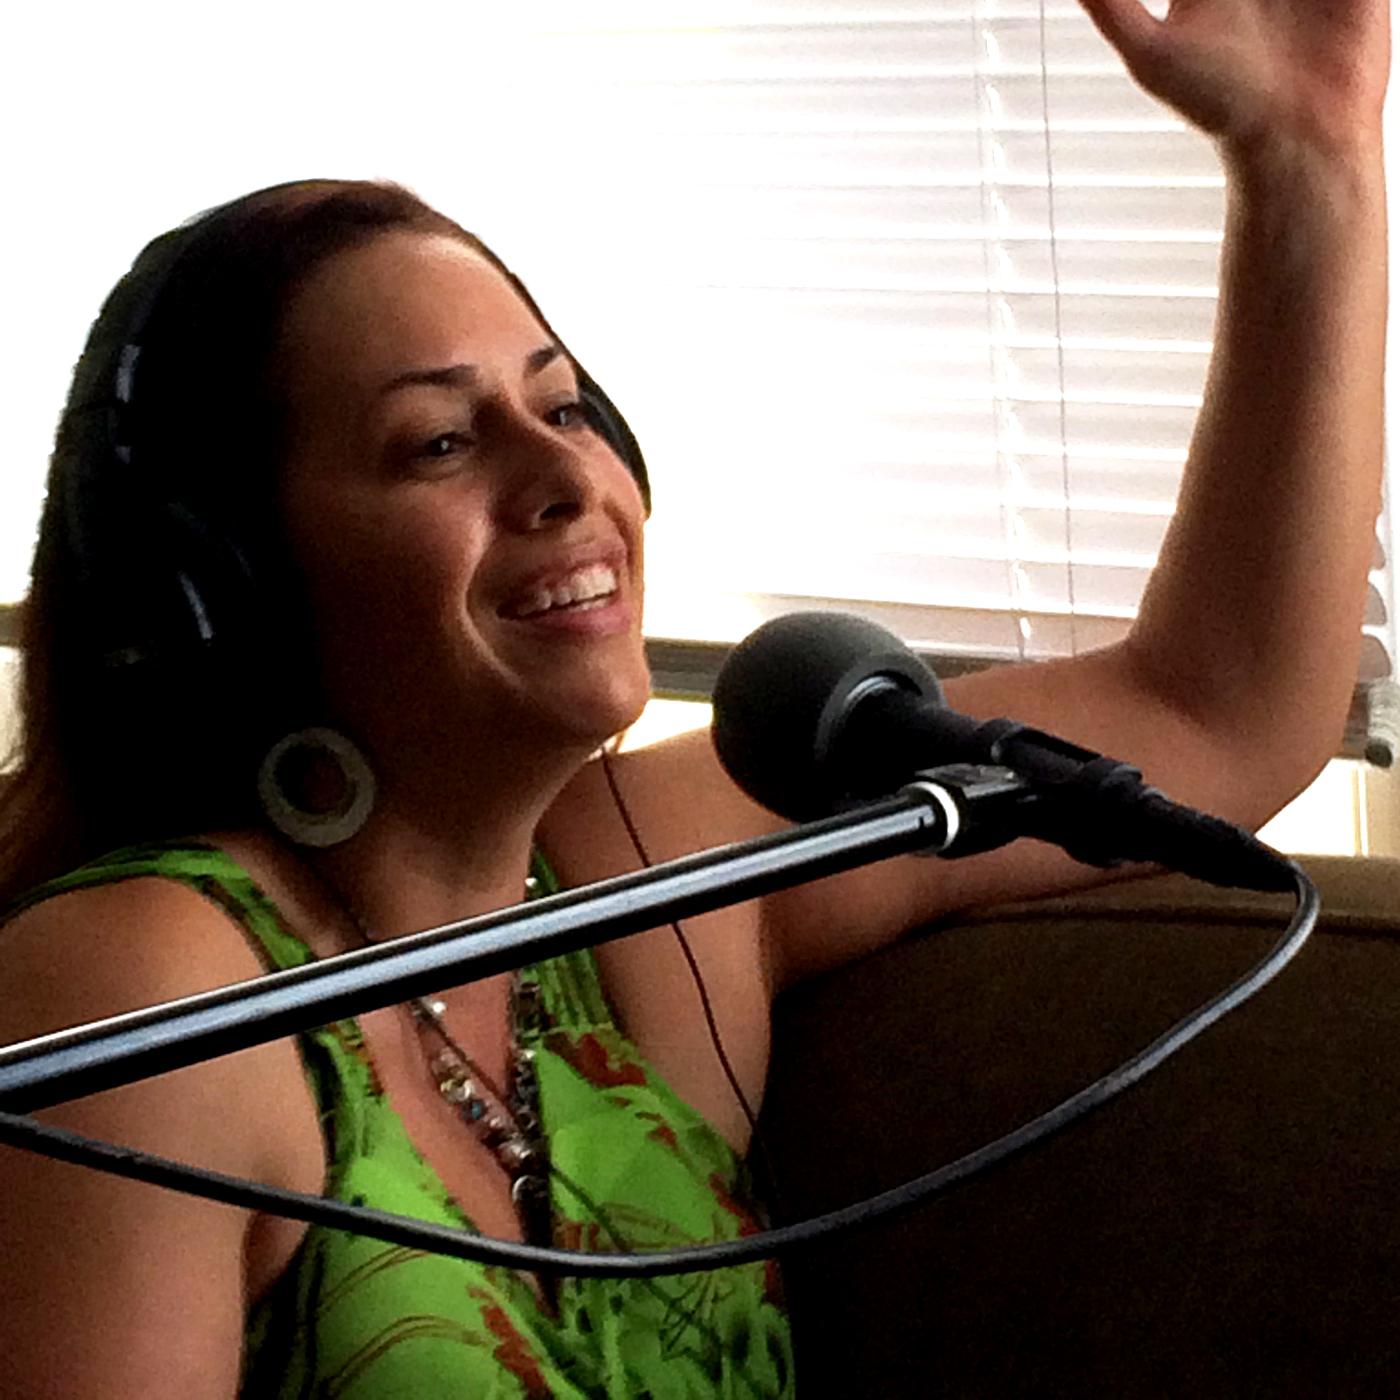 Caption: Gina Garro on MIW, Credit: Oddua Productions